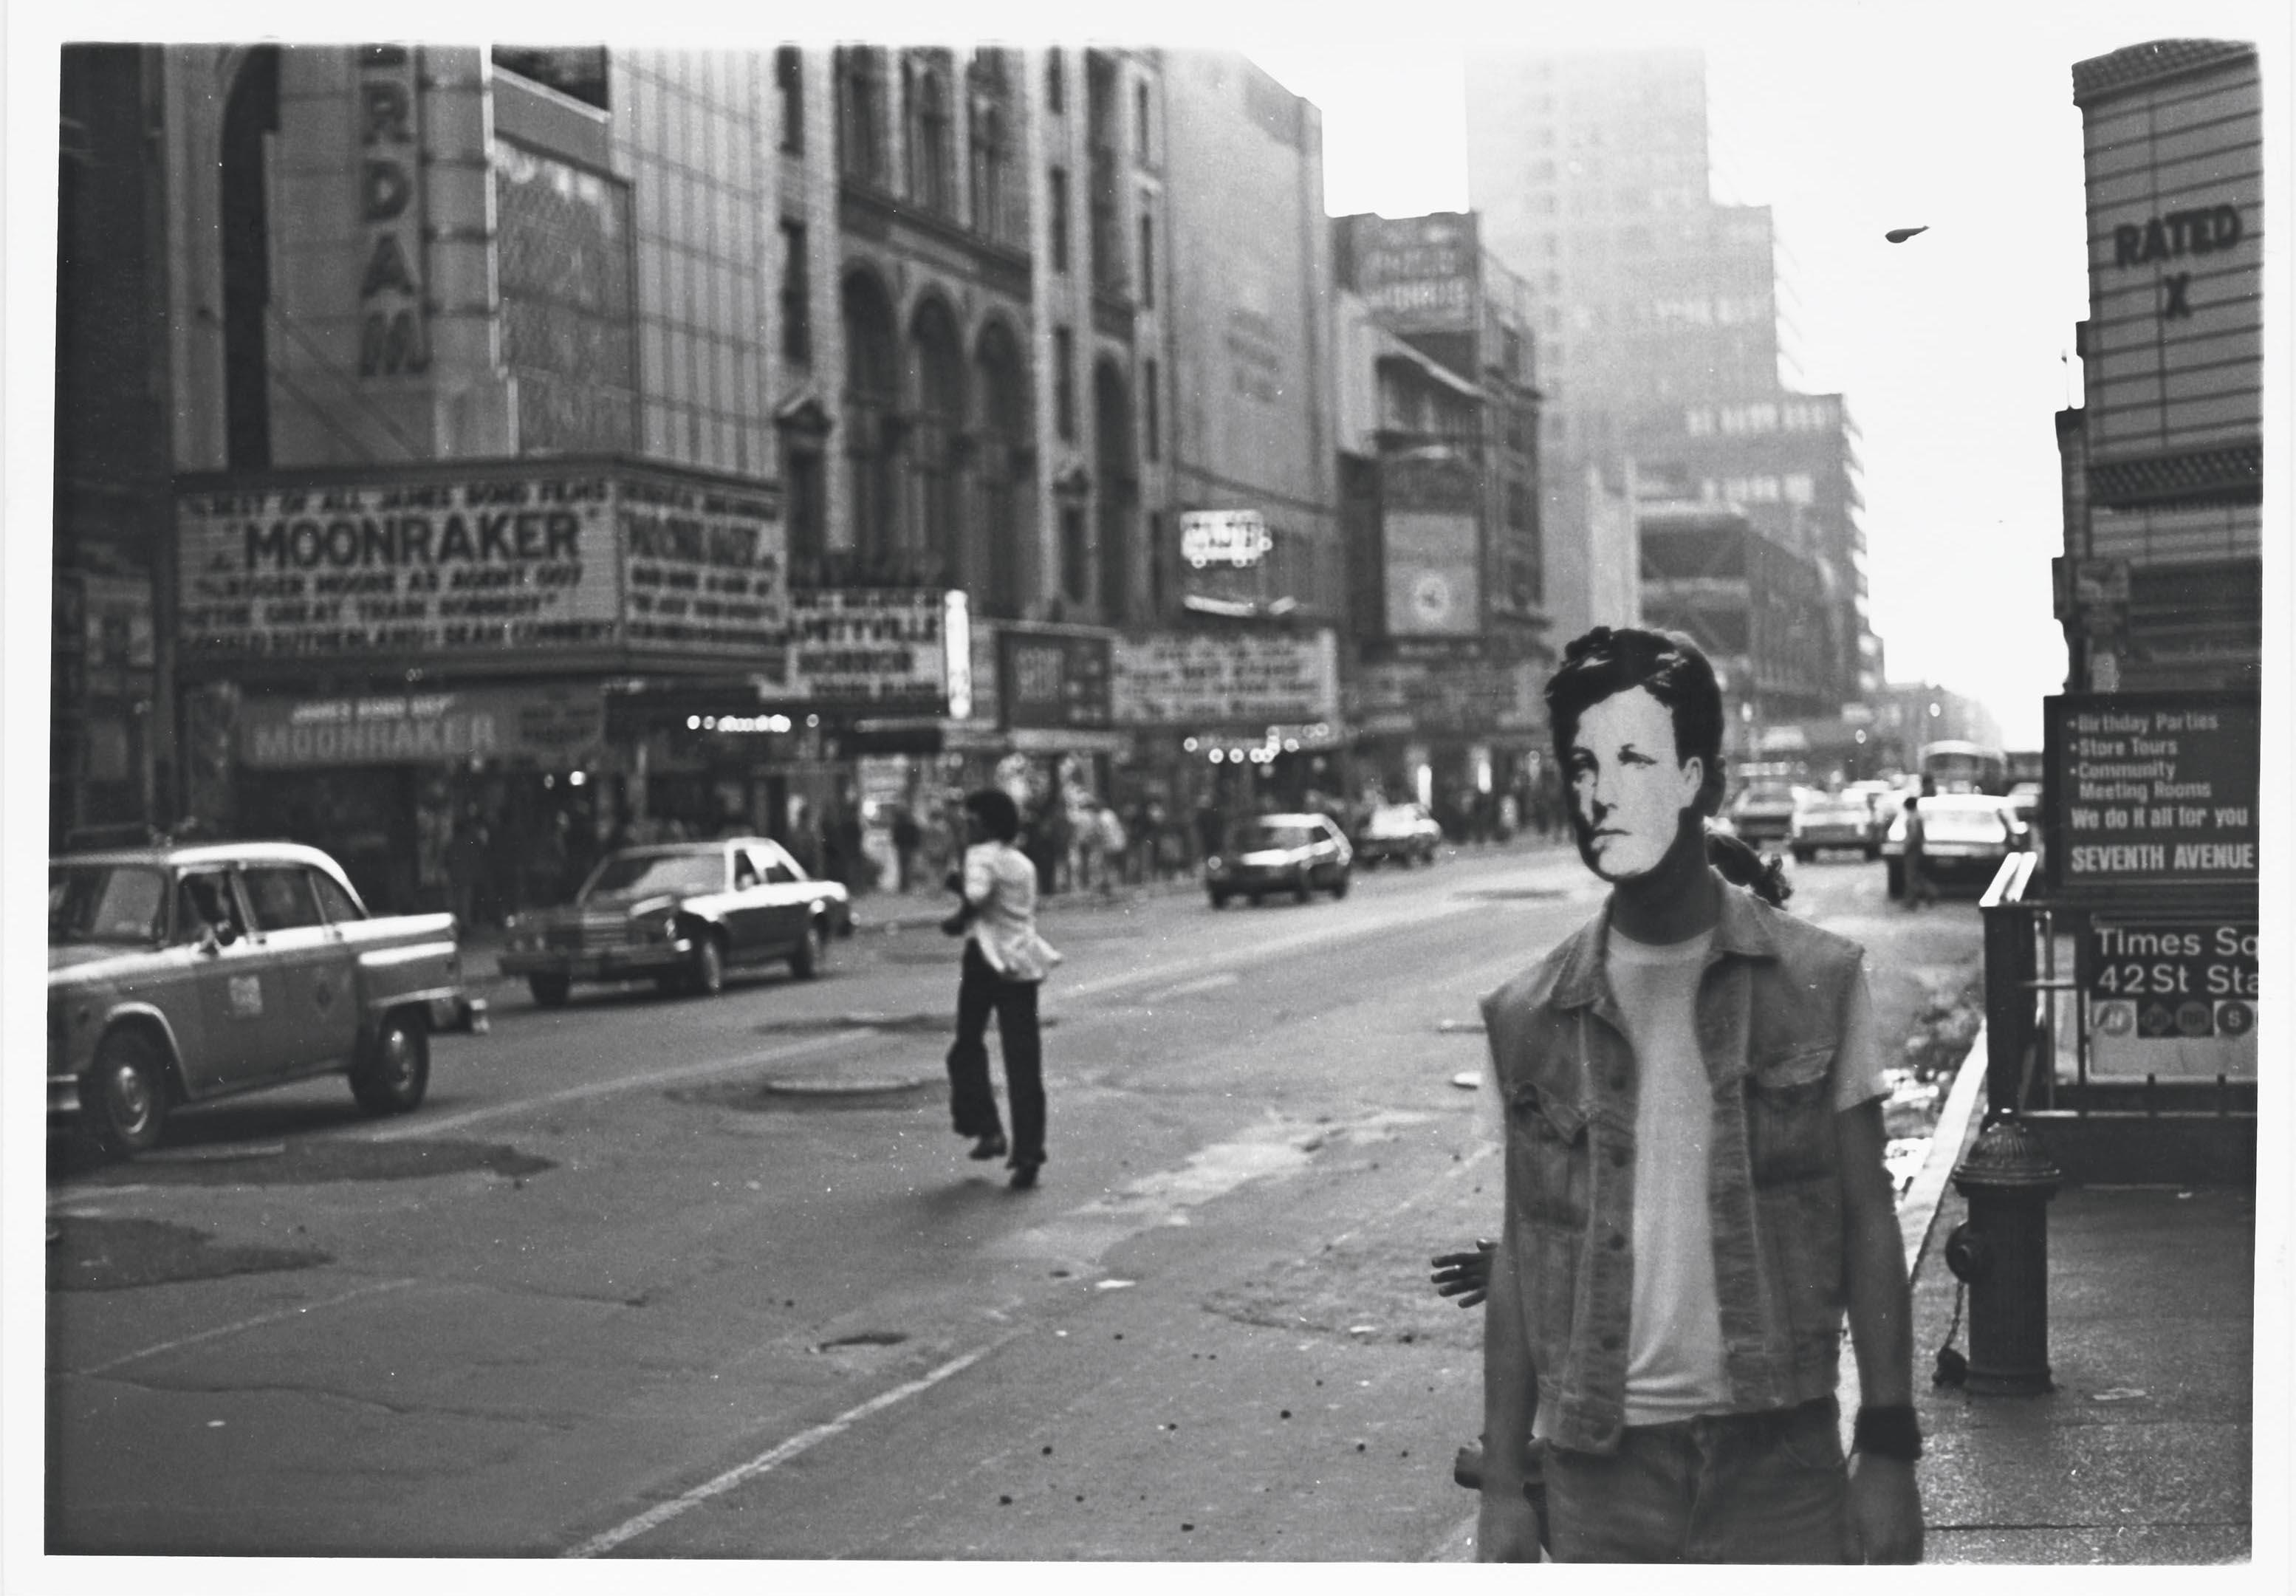 David Wojnarowicz, Arthur Rimbaud in New York, 1978-1979. Courtesy of PPOW Gallery, NY and the Estate of David Wojnarowicz